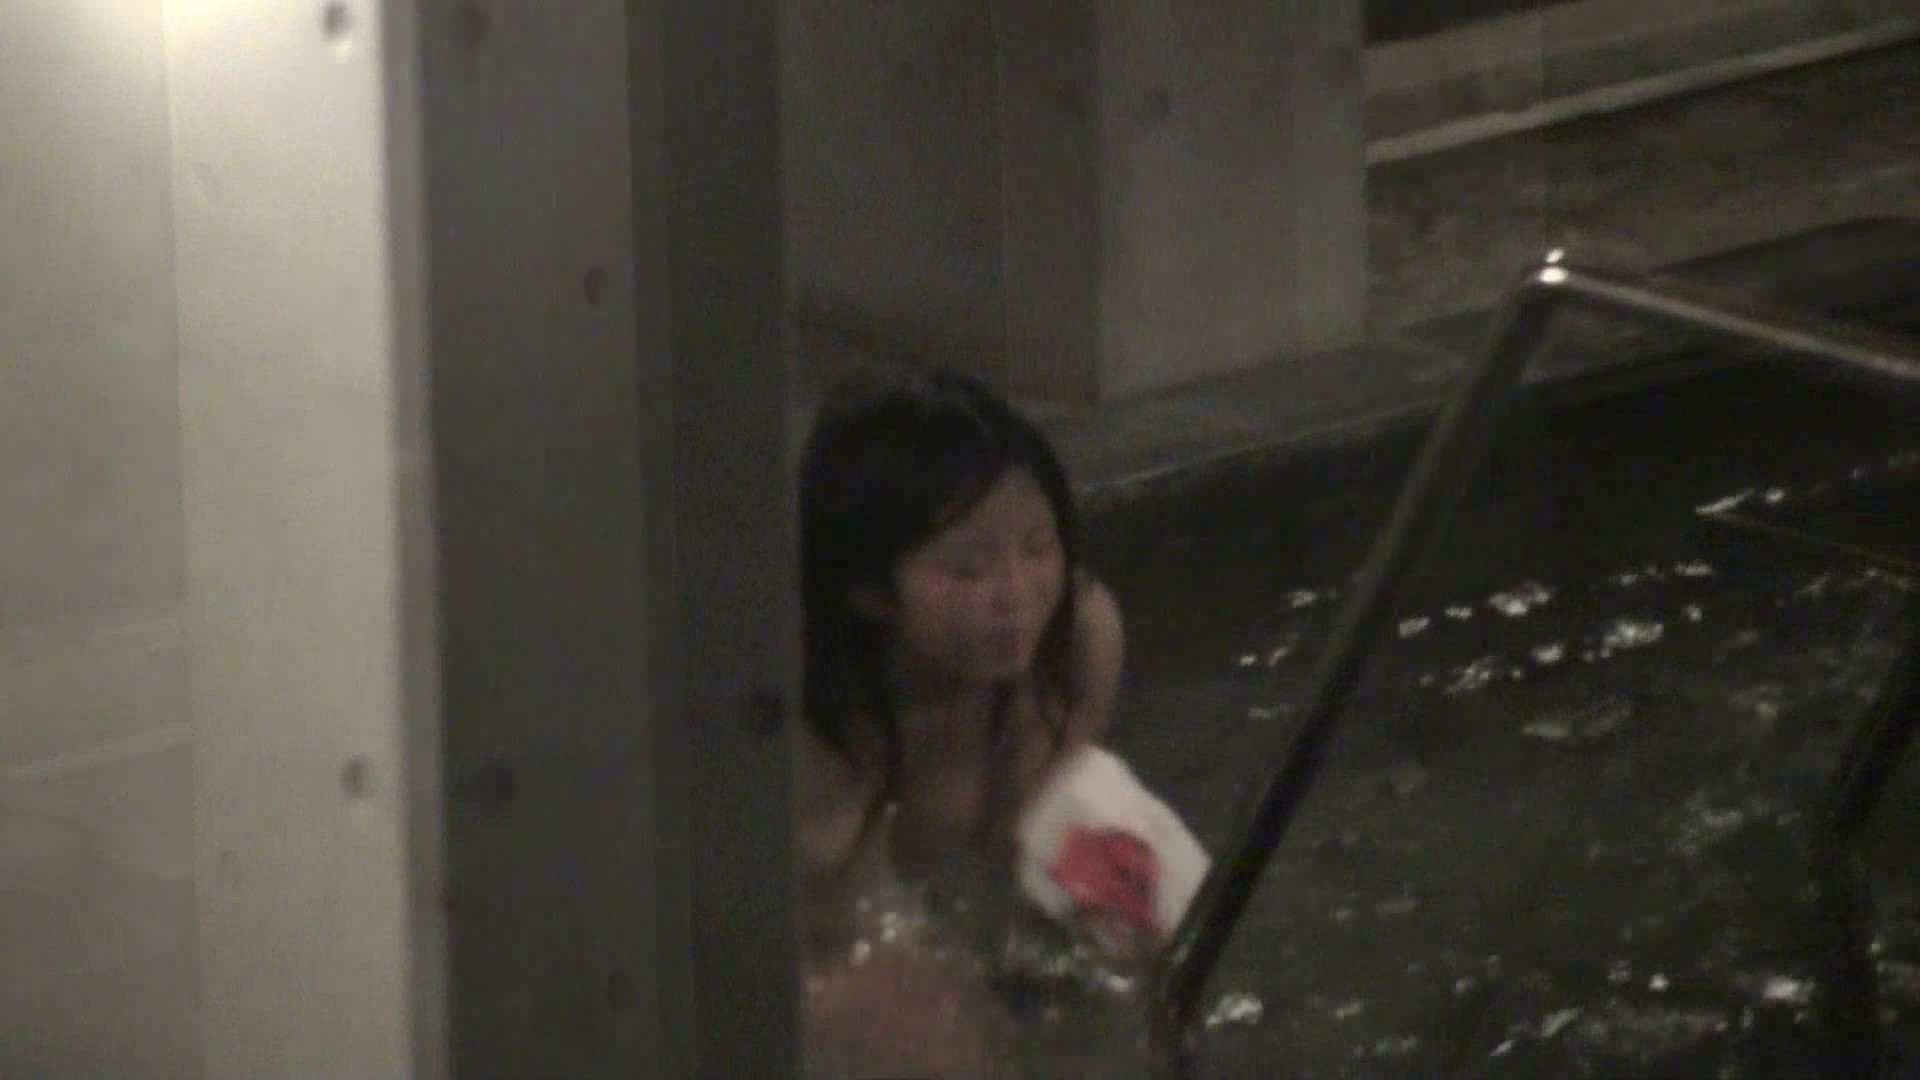 Aquaな露天風呂Vol.326 OLセックス | 露天  105画像 46